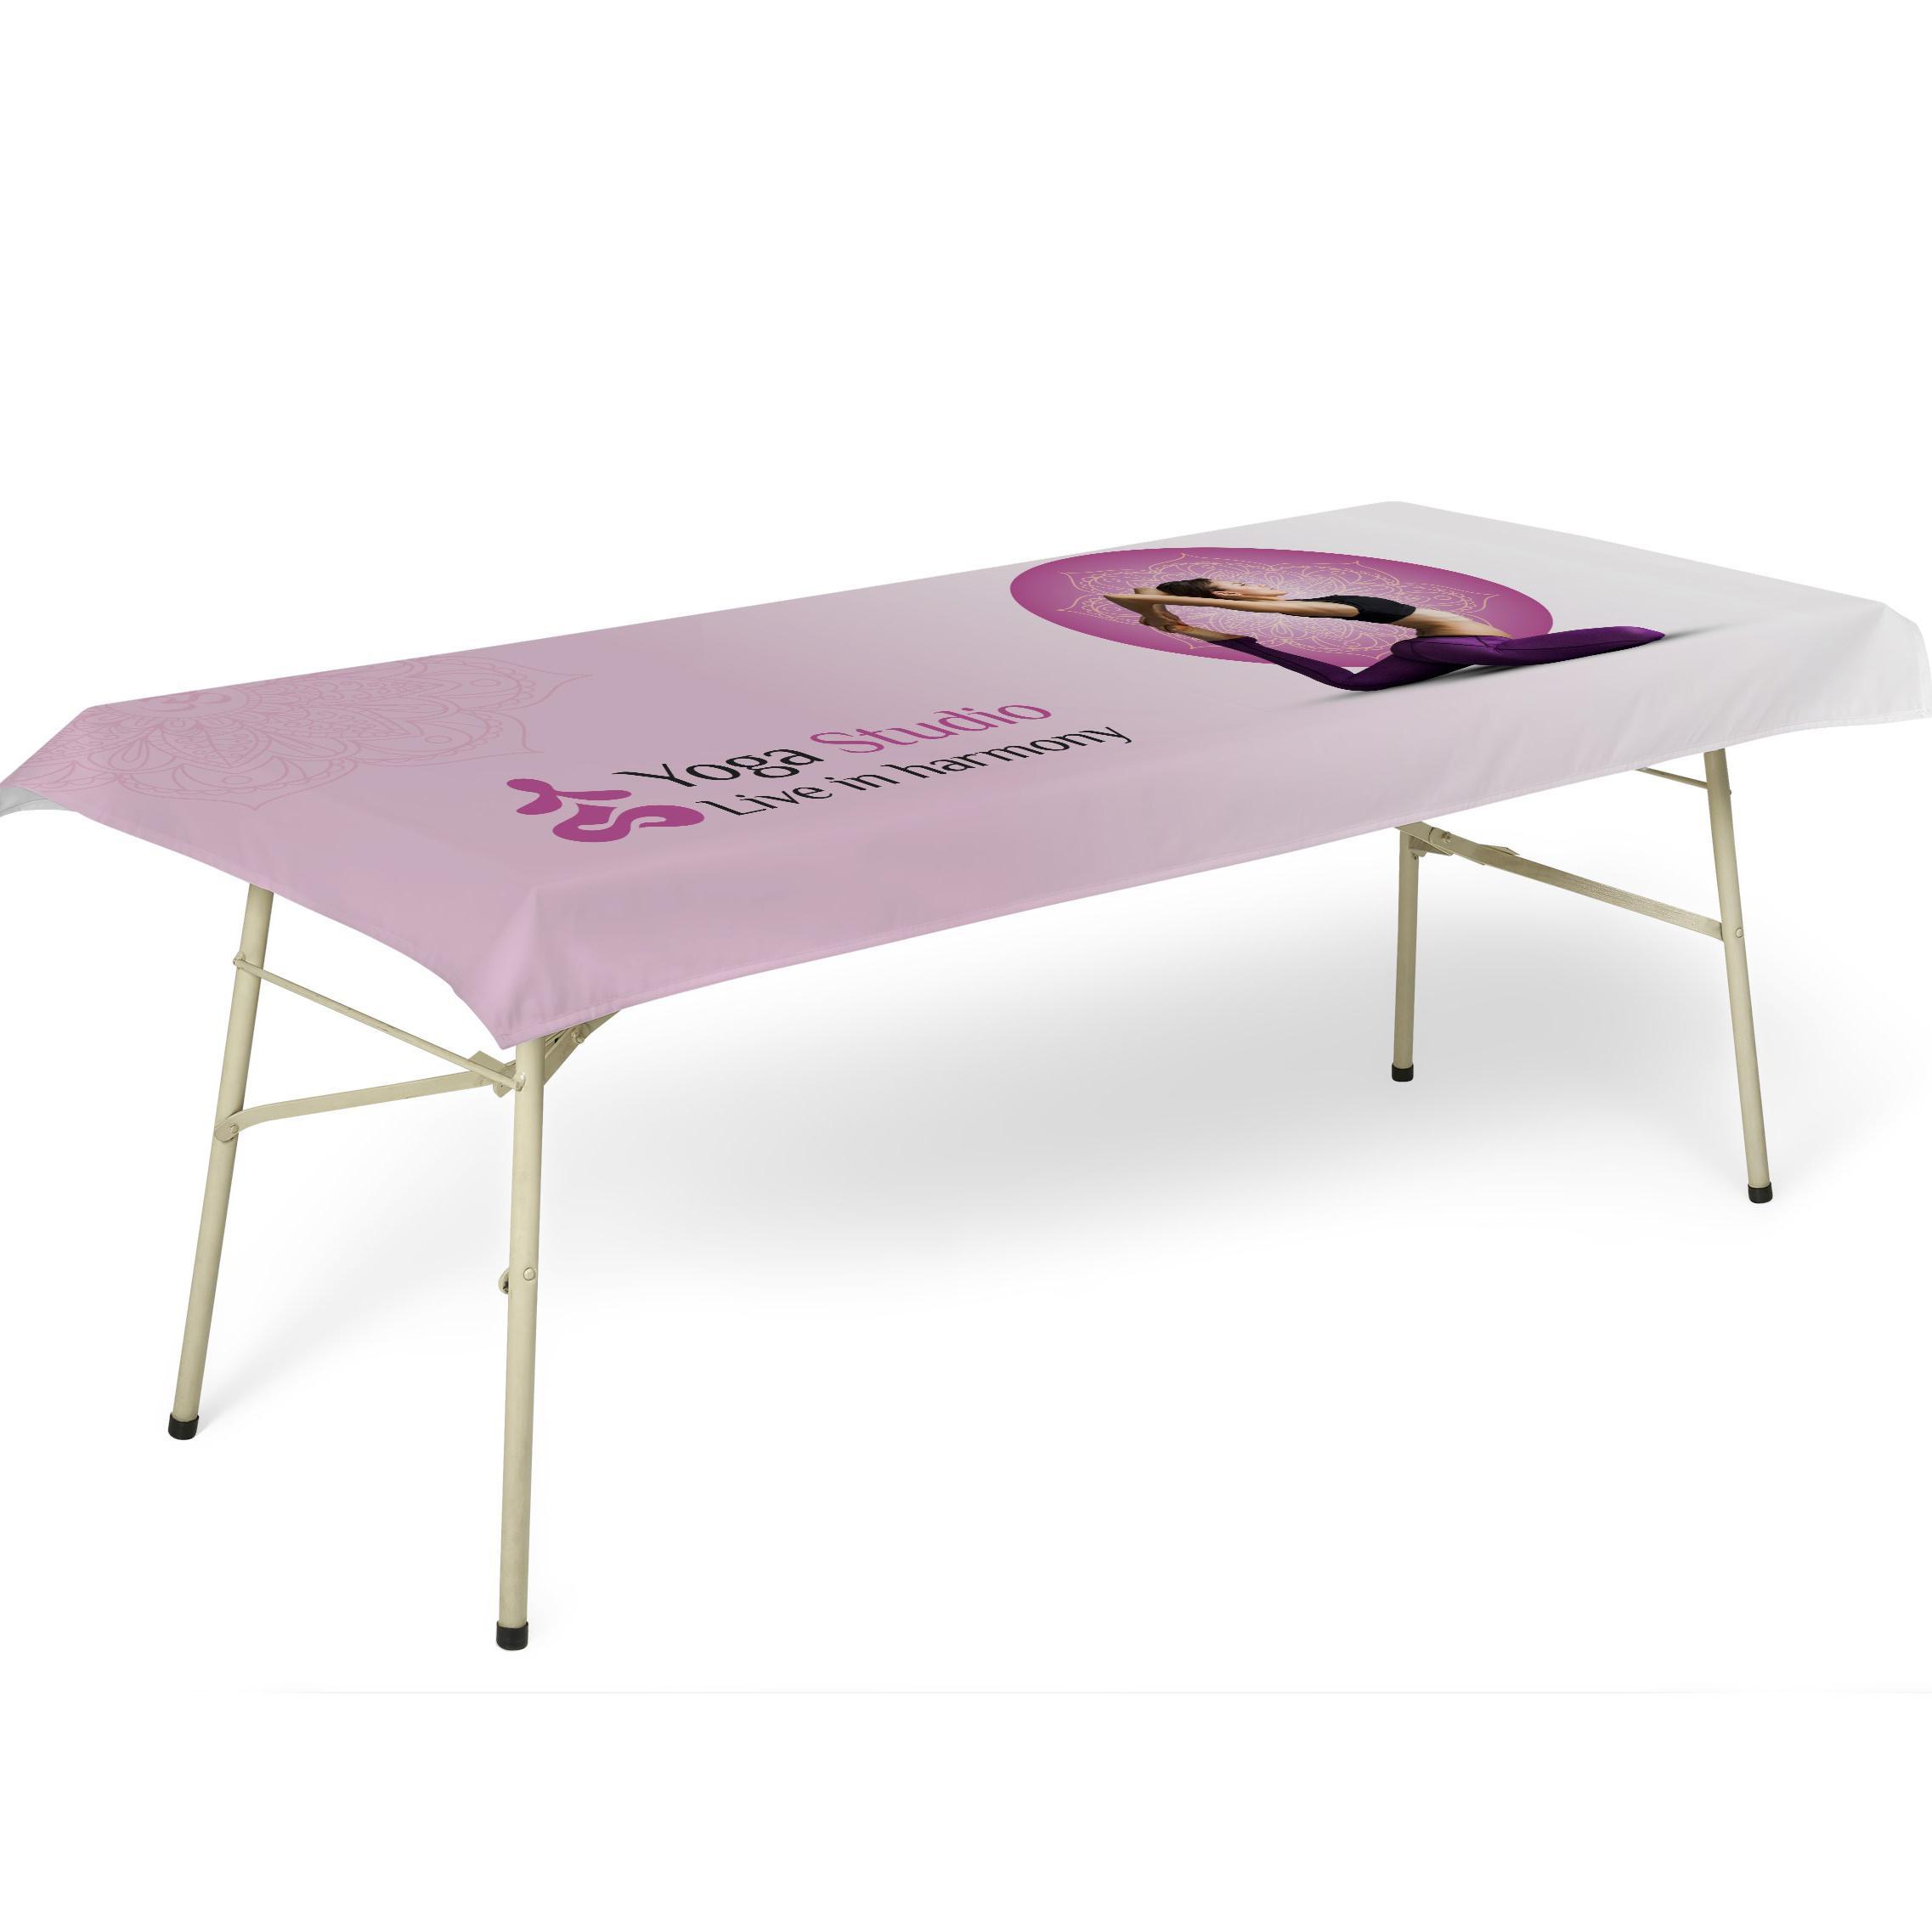 Legend Fabric Tablecloth 2m X 1m